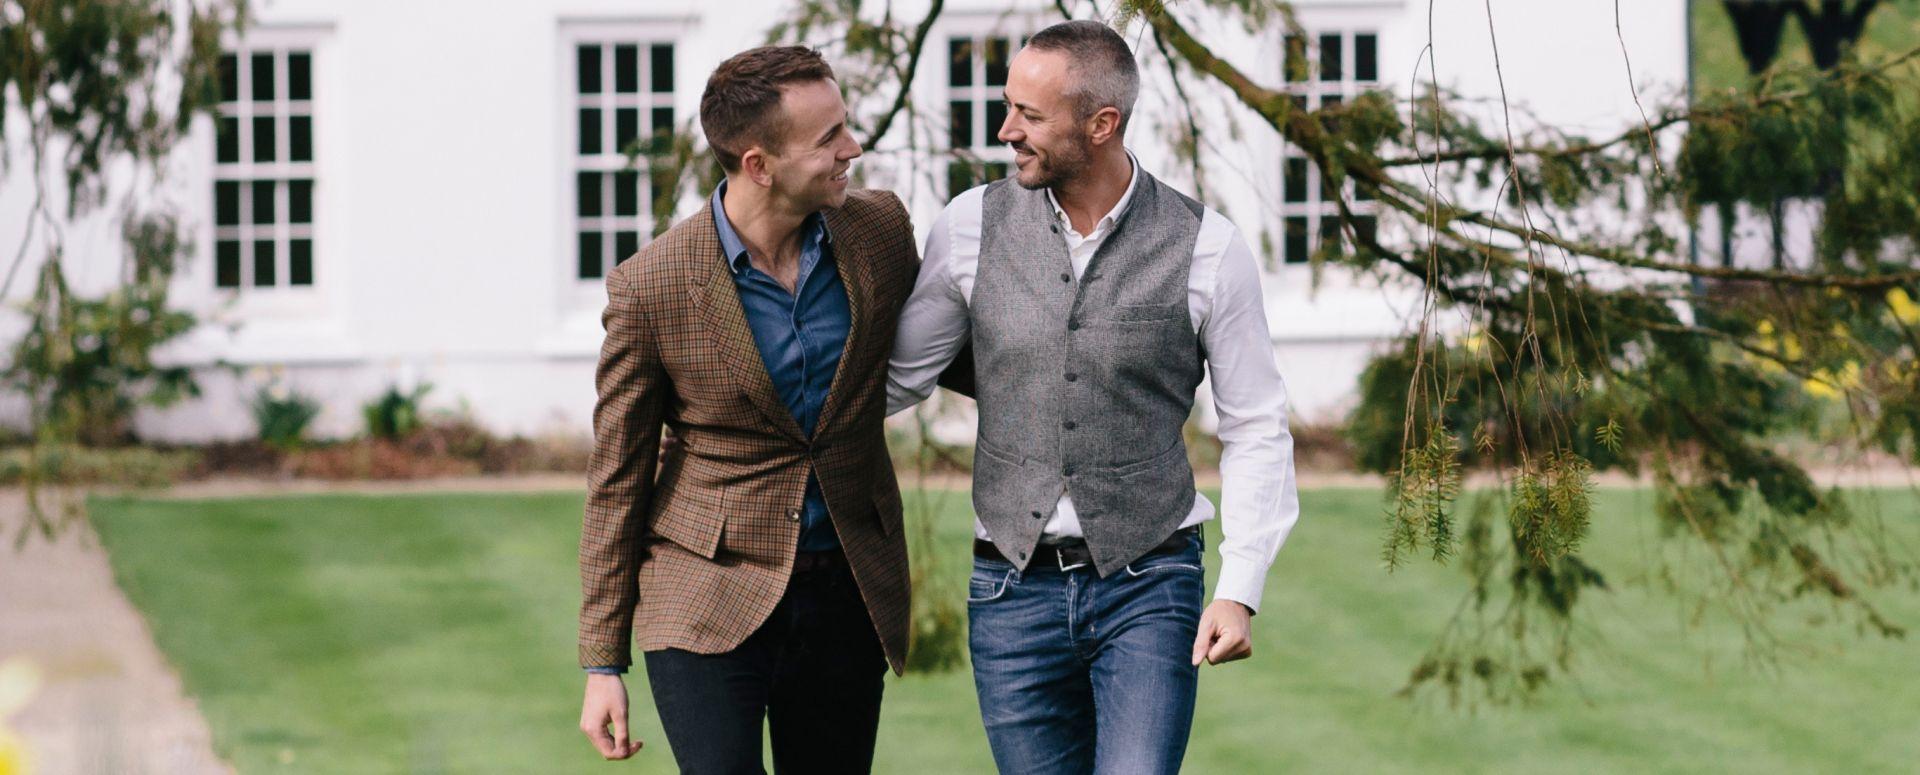 Gay dating Pembrokeshire